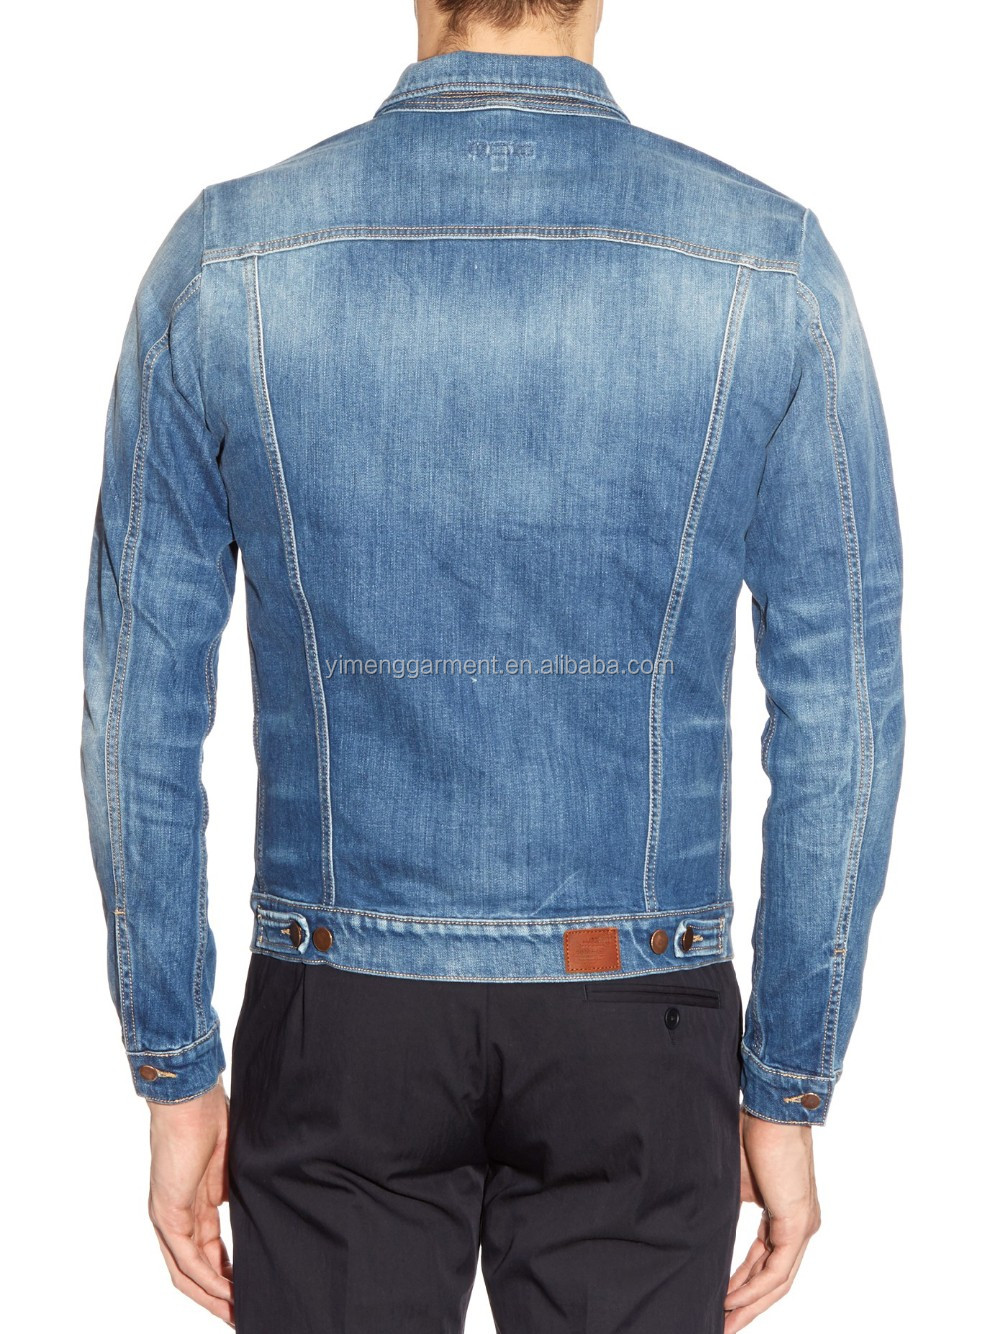 Custom Jeans Manufacturers China Bulk Wholesale Denim ...